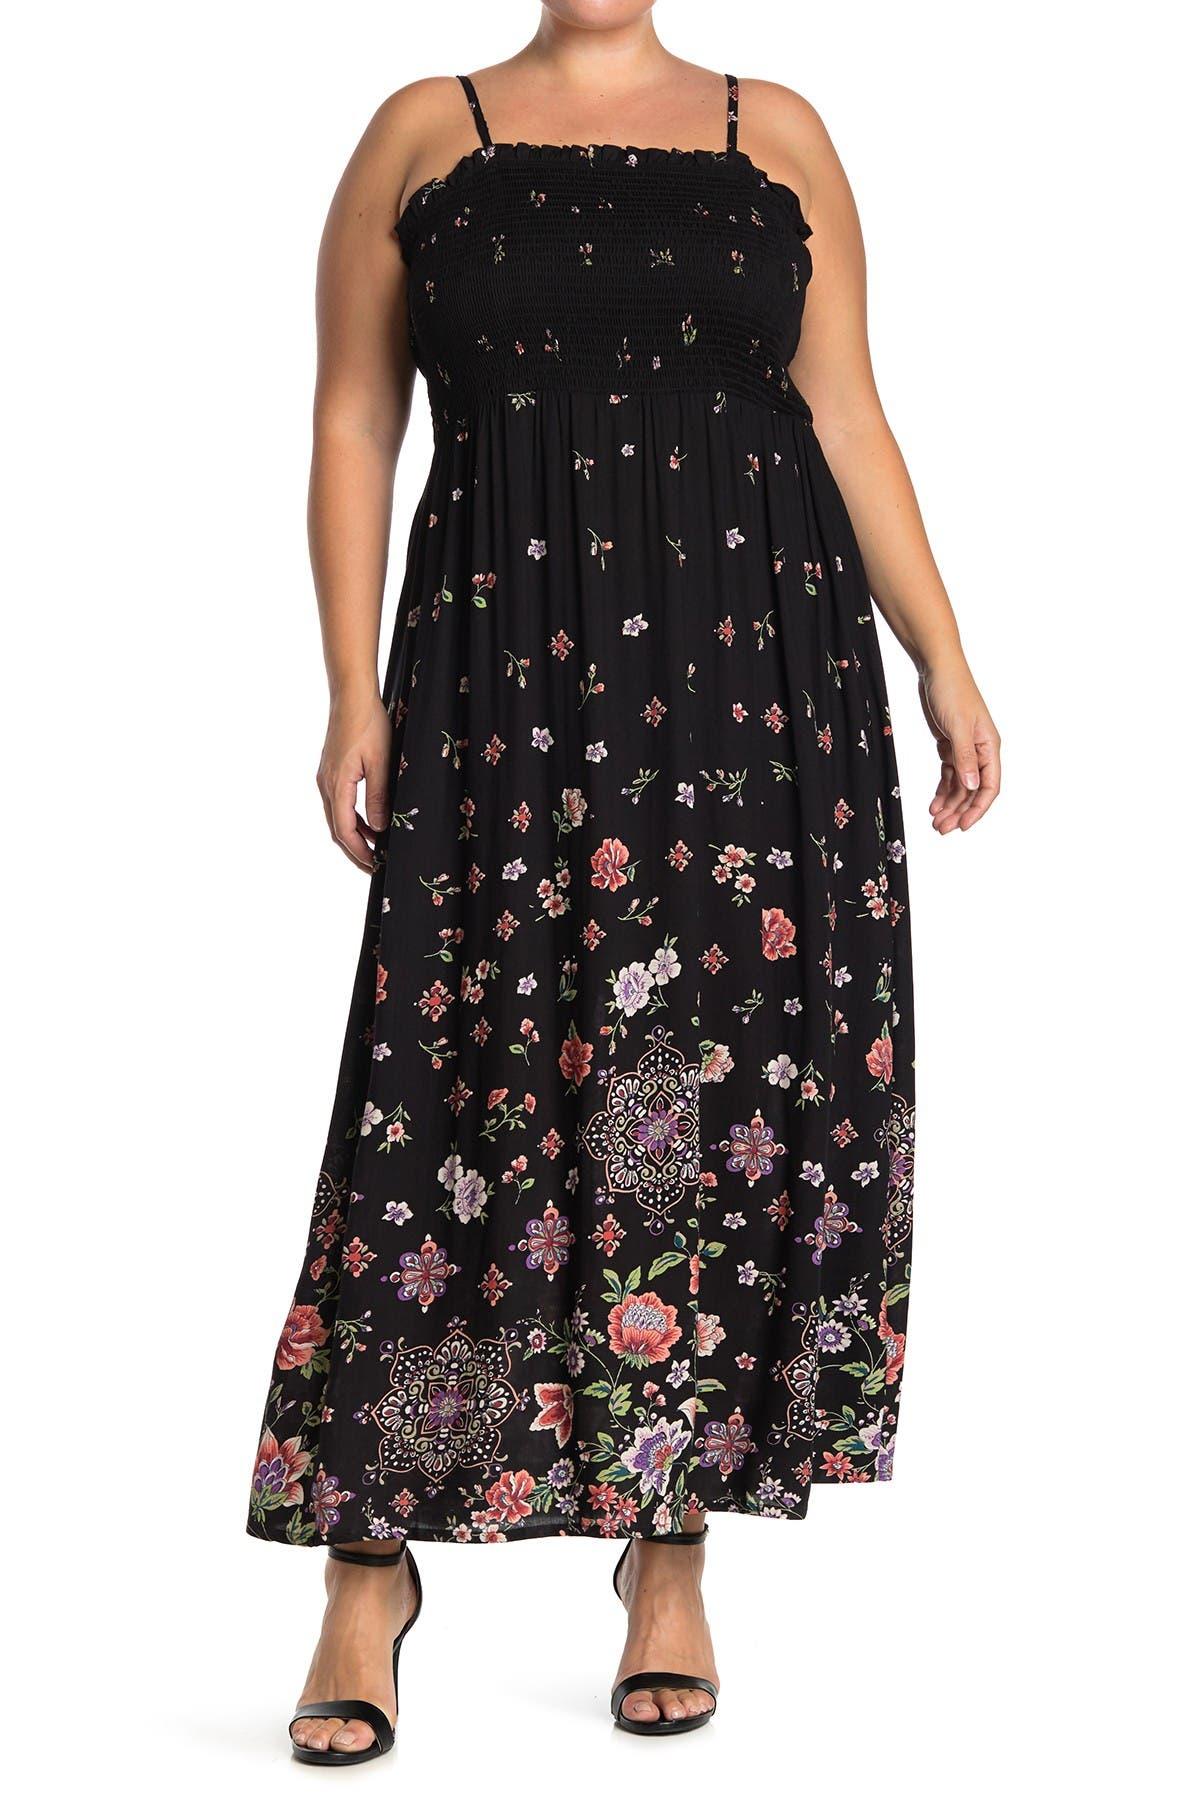 Angie Womens Black Smocked Bodice Cold Shoulder Dress